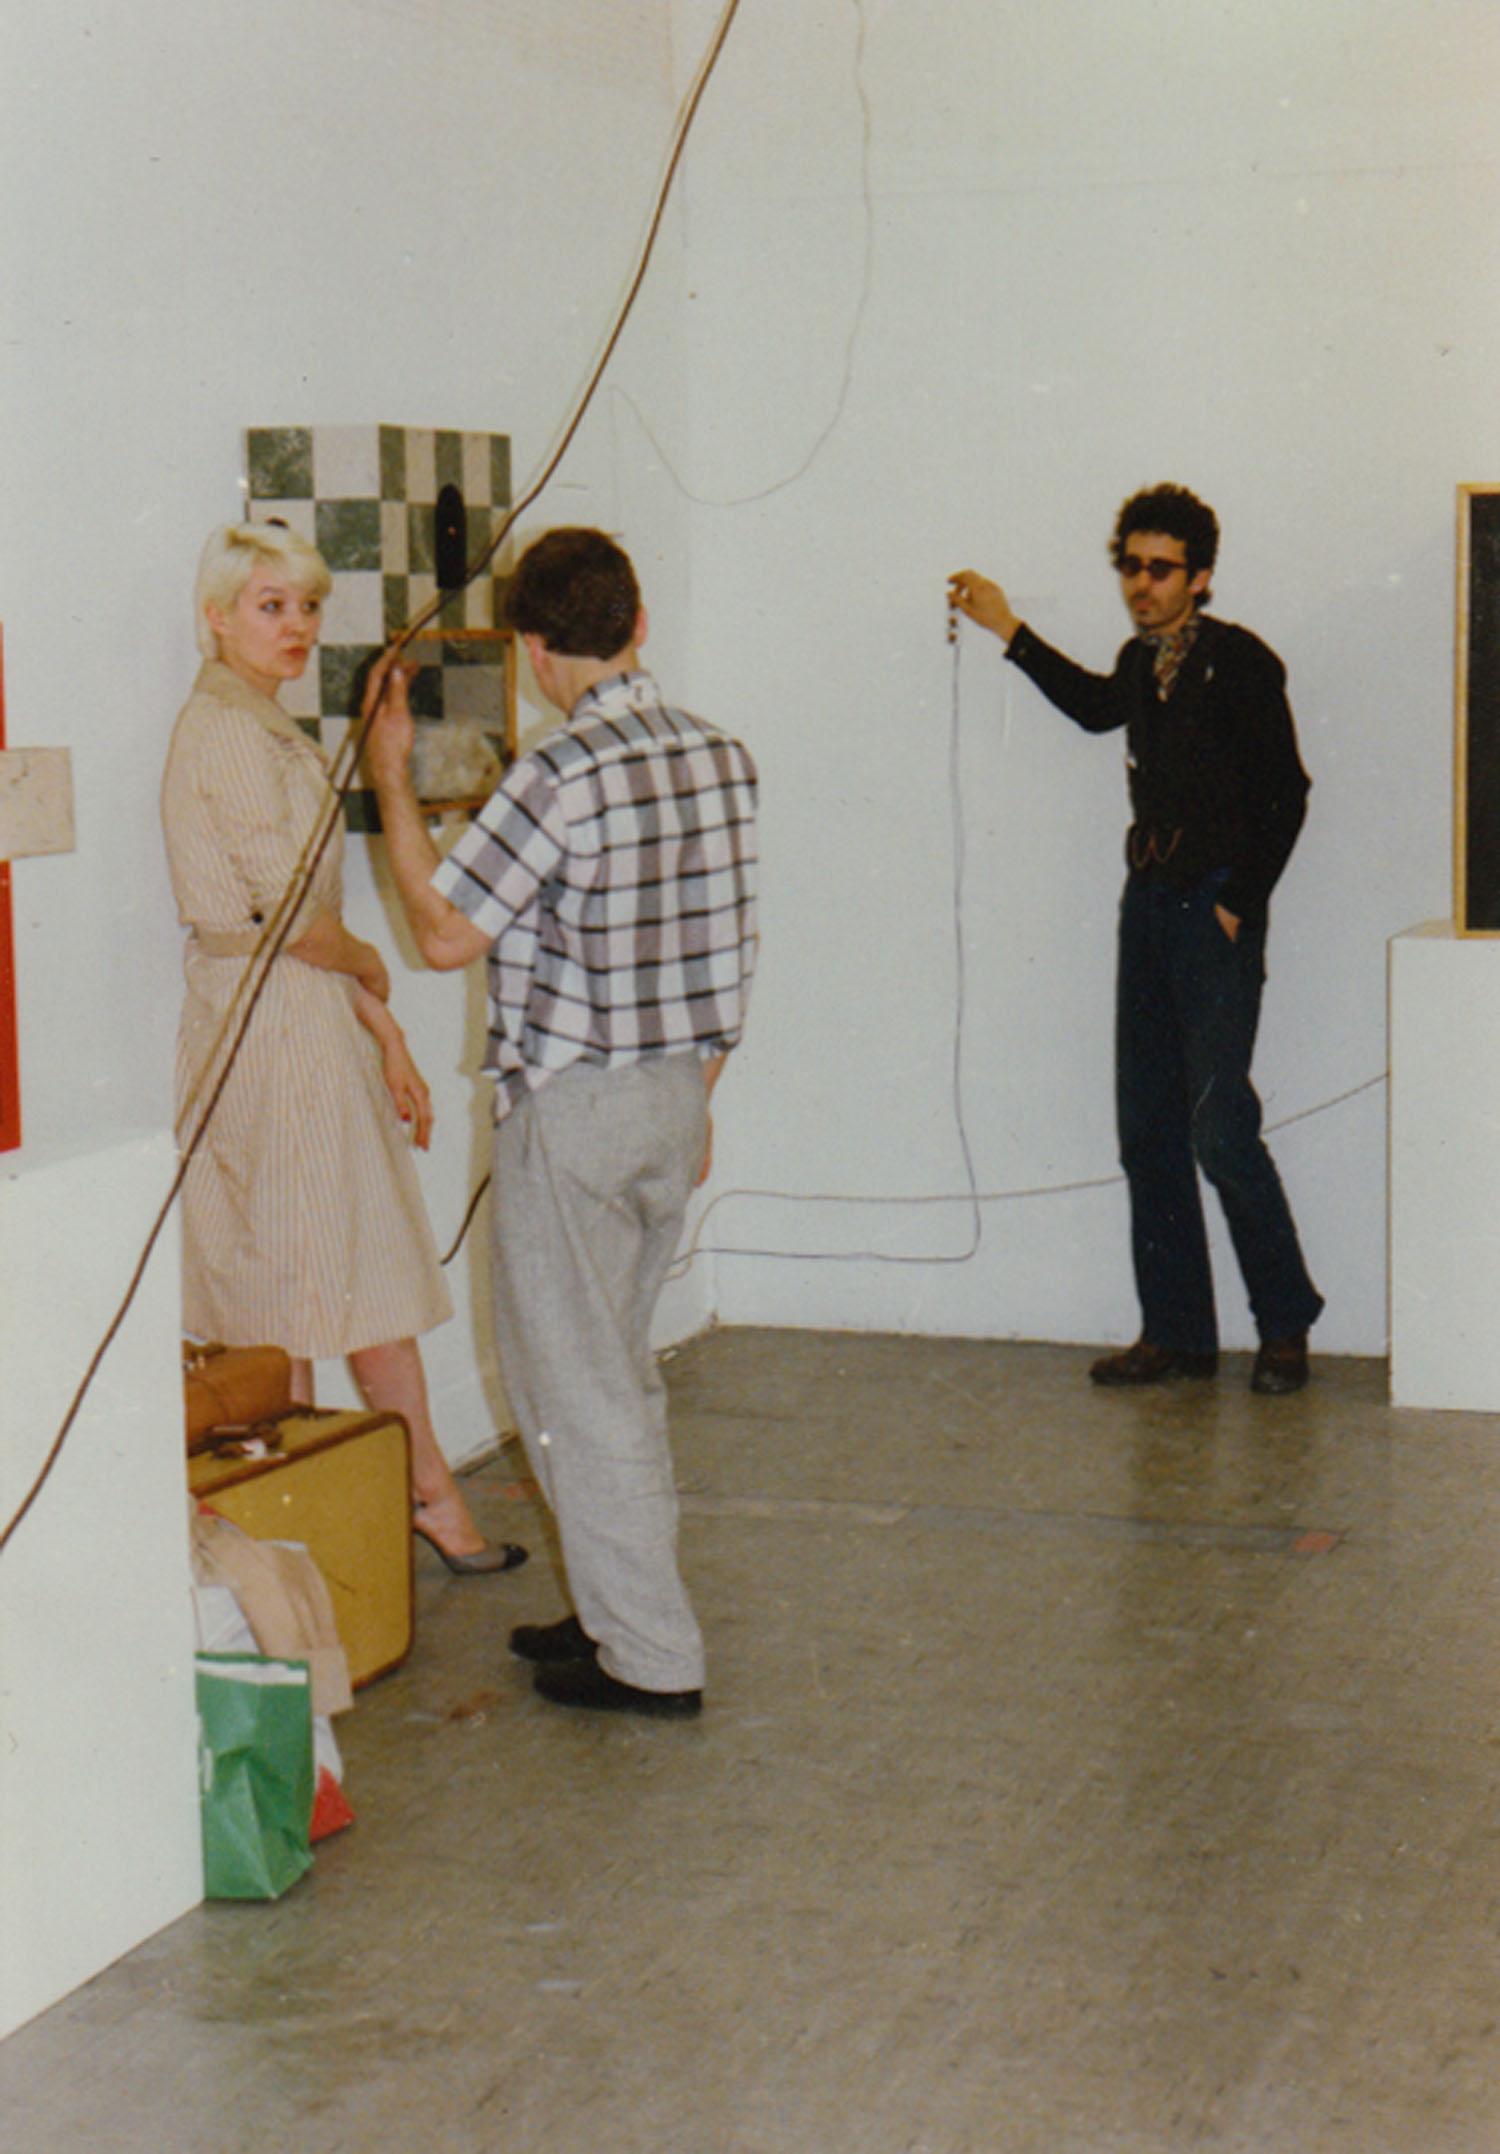 Patti Astor, Steven Kramer and Henry Benvenuti, Washington DC, 1978